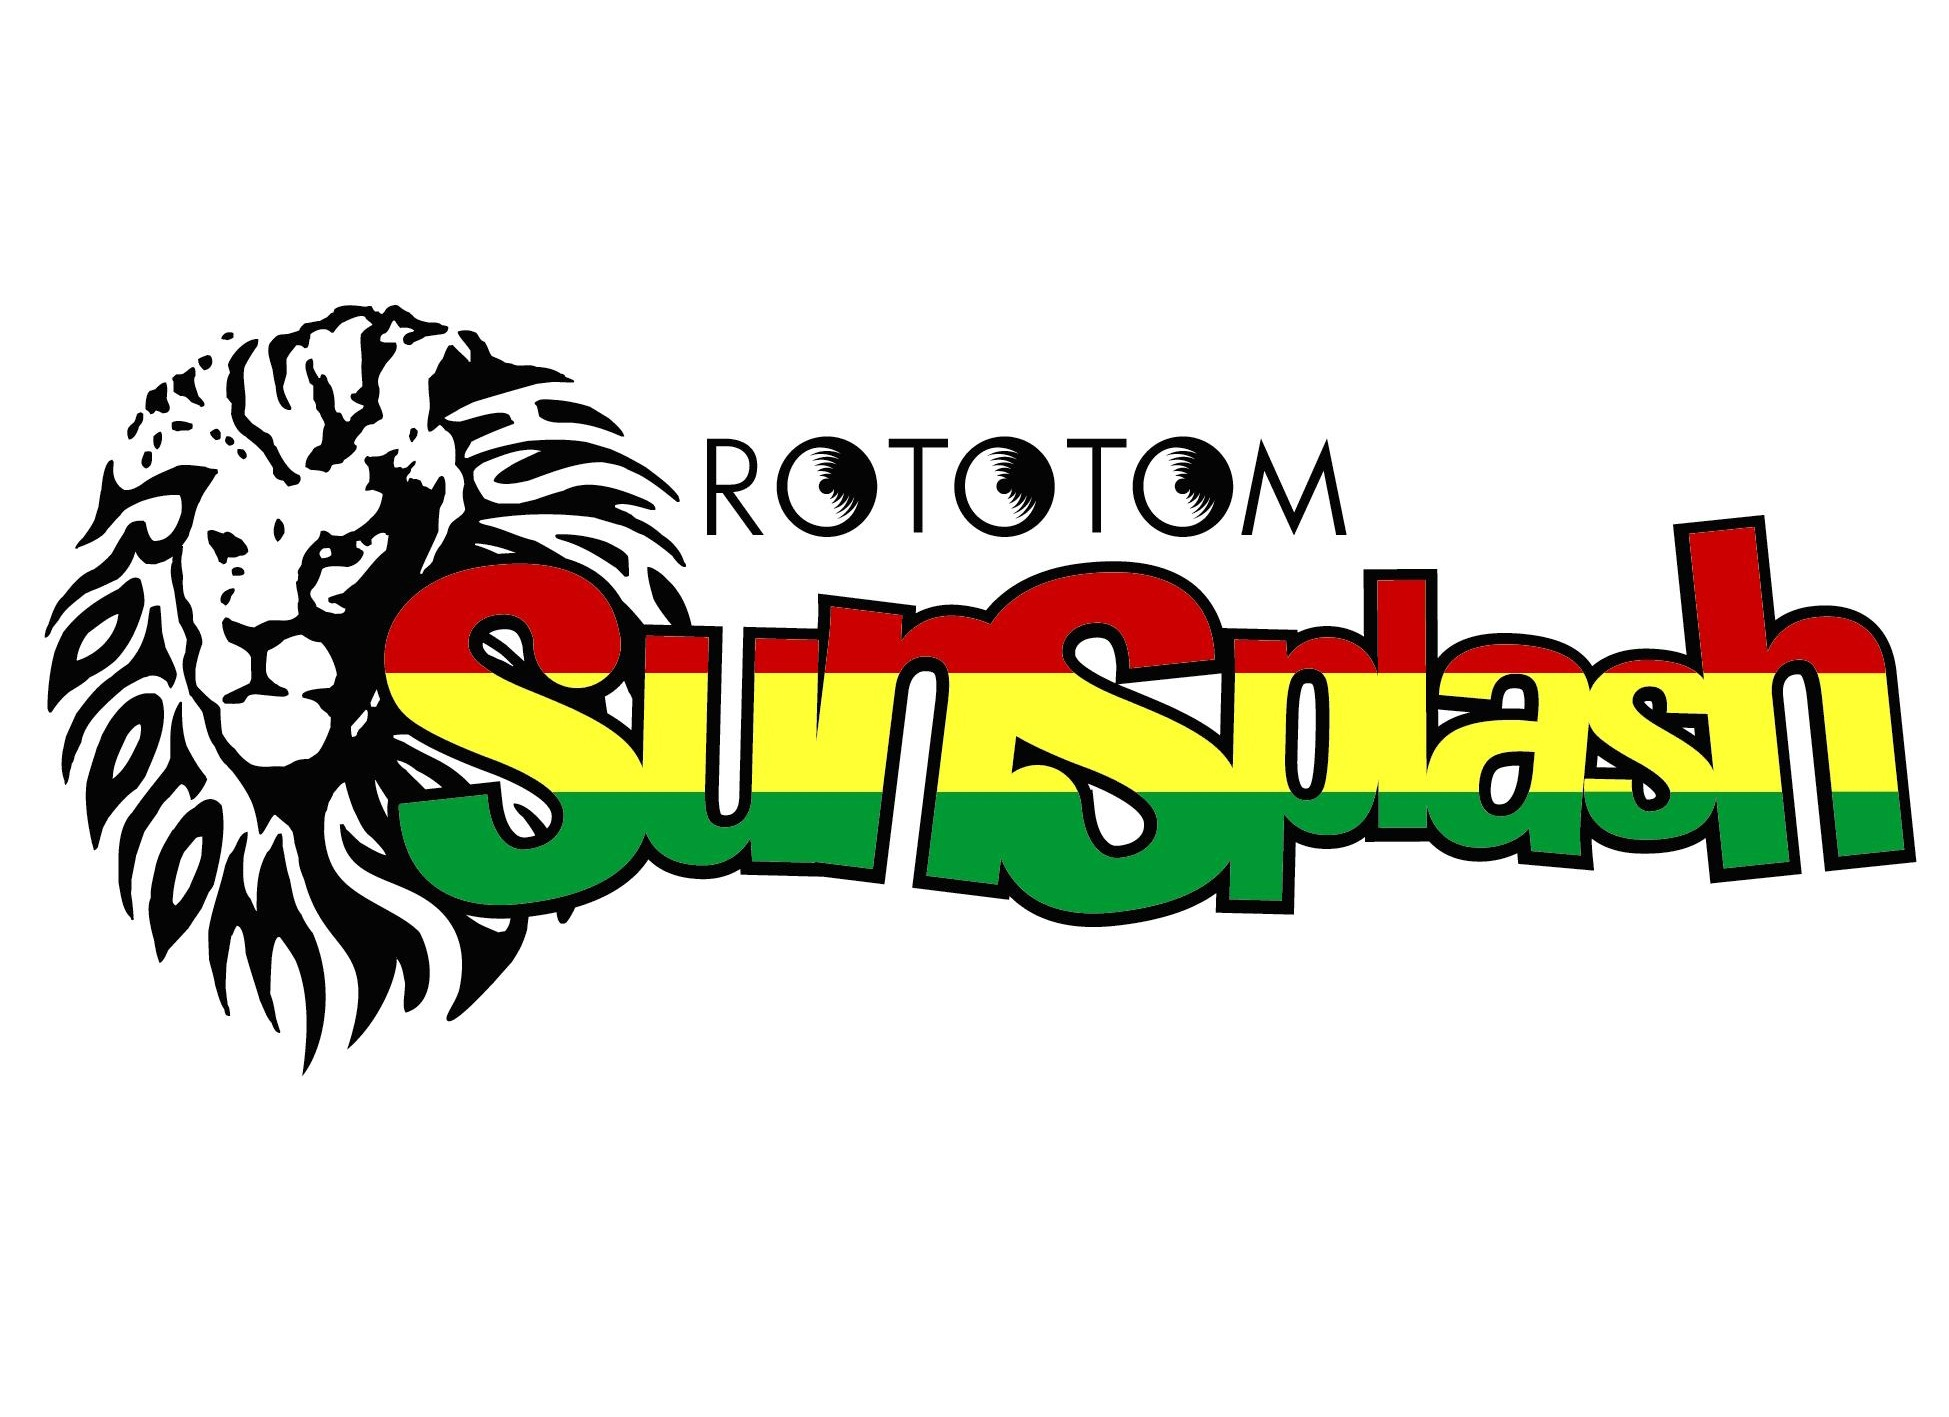 rototom sunsplash logo festival